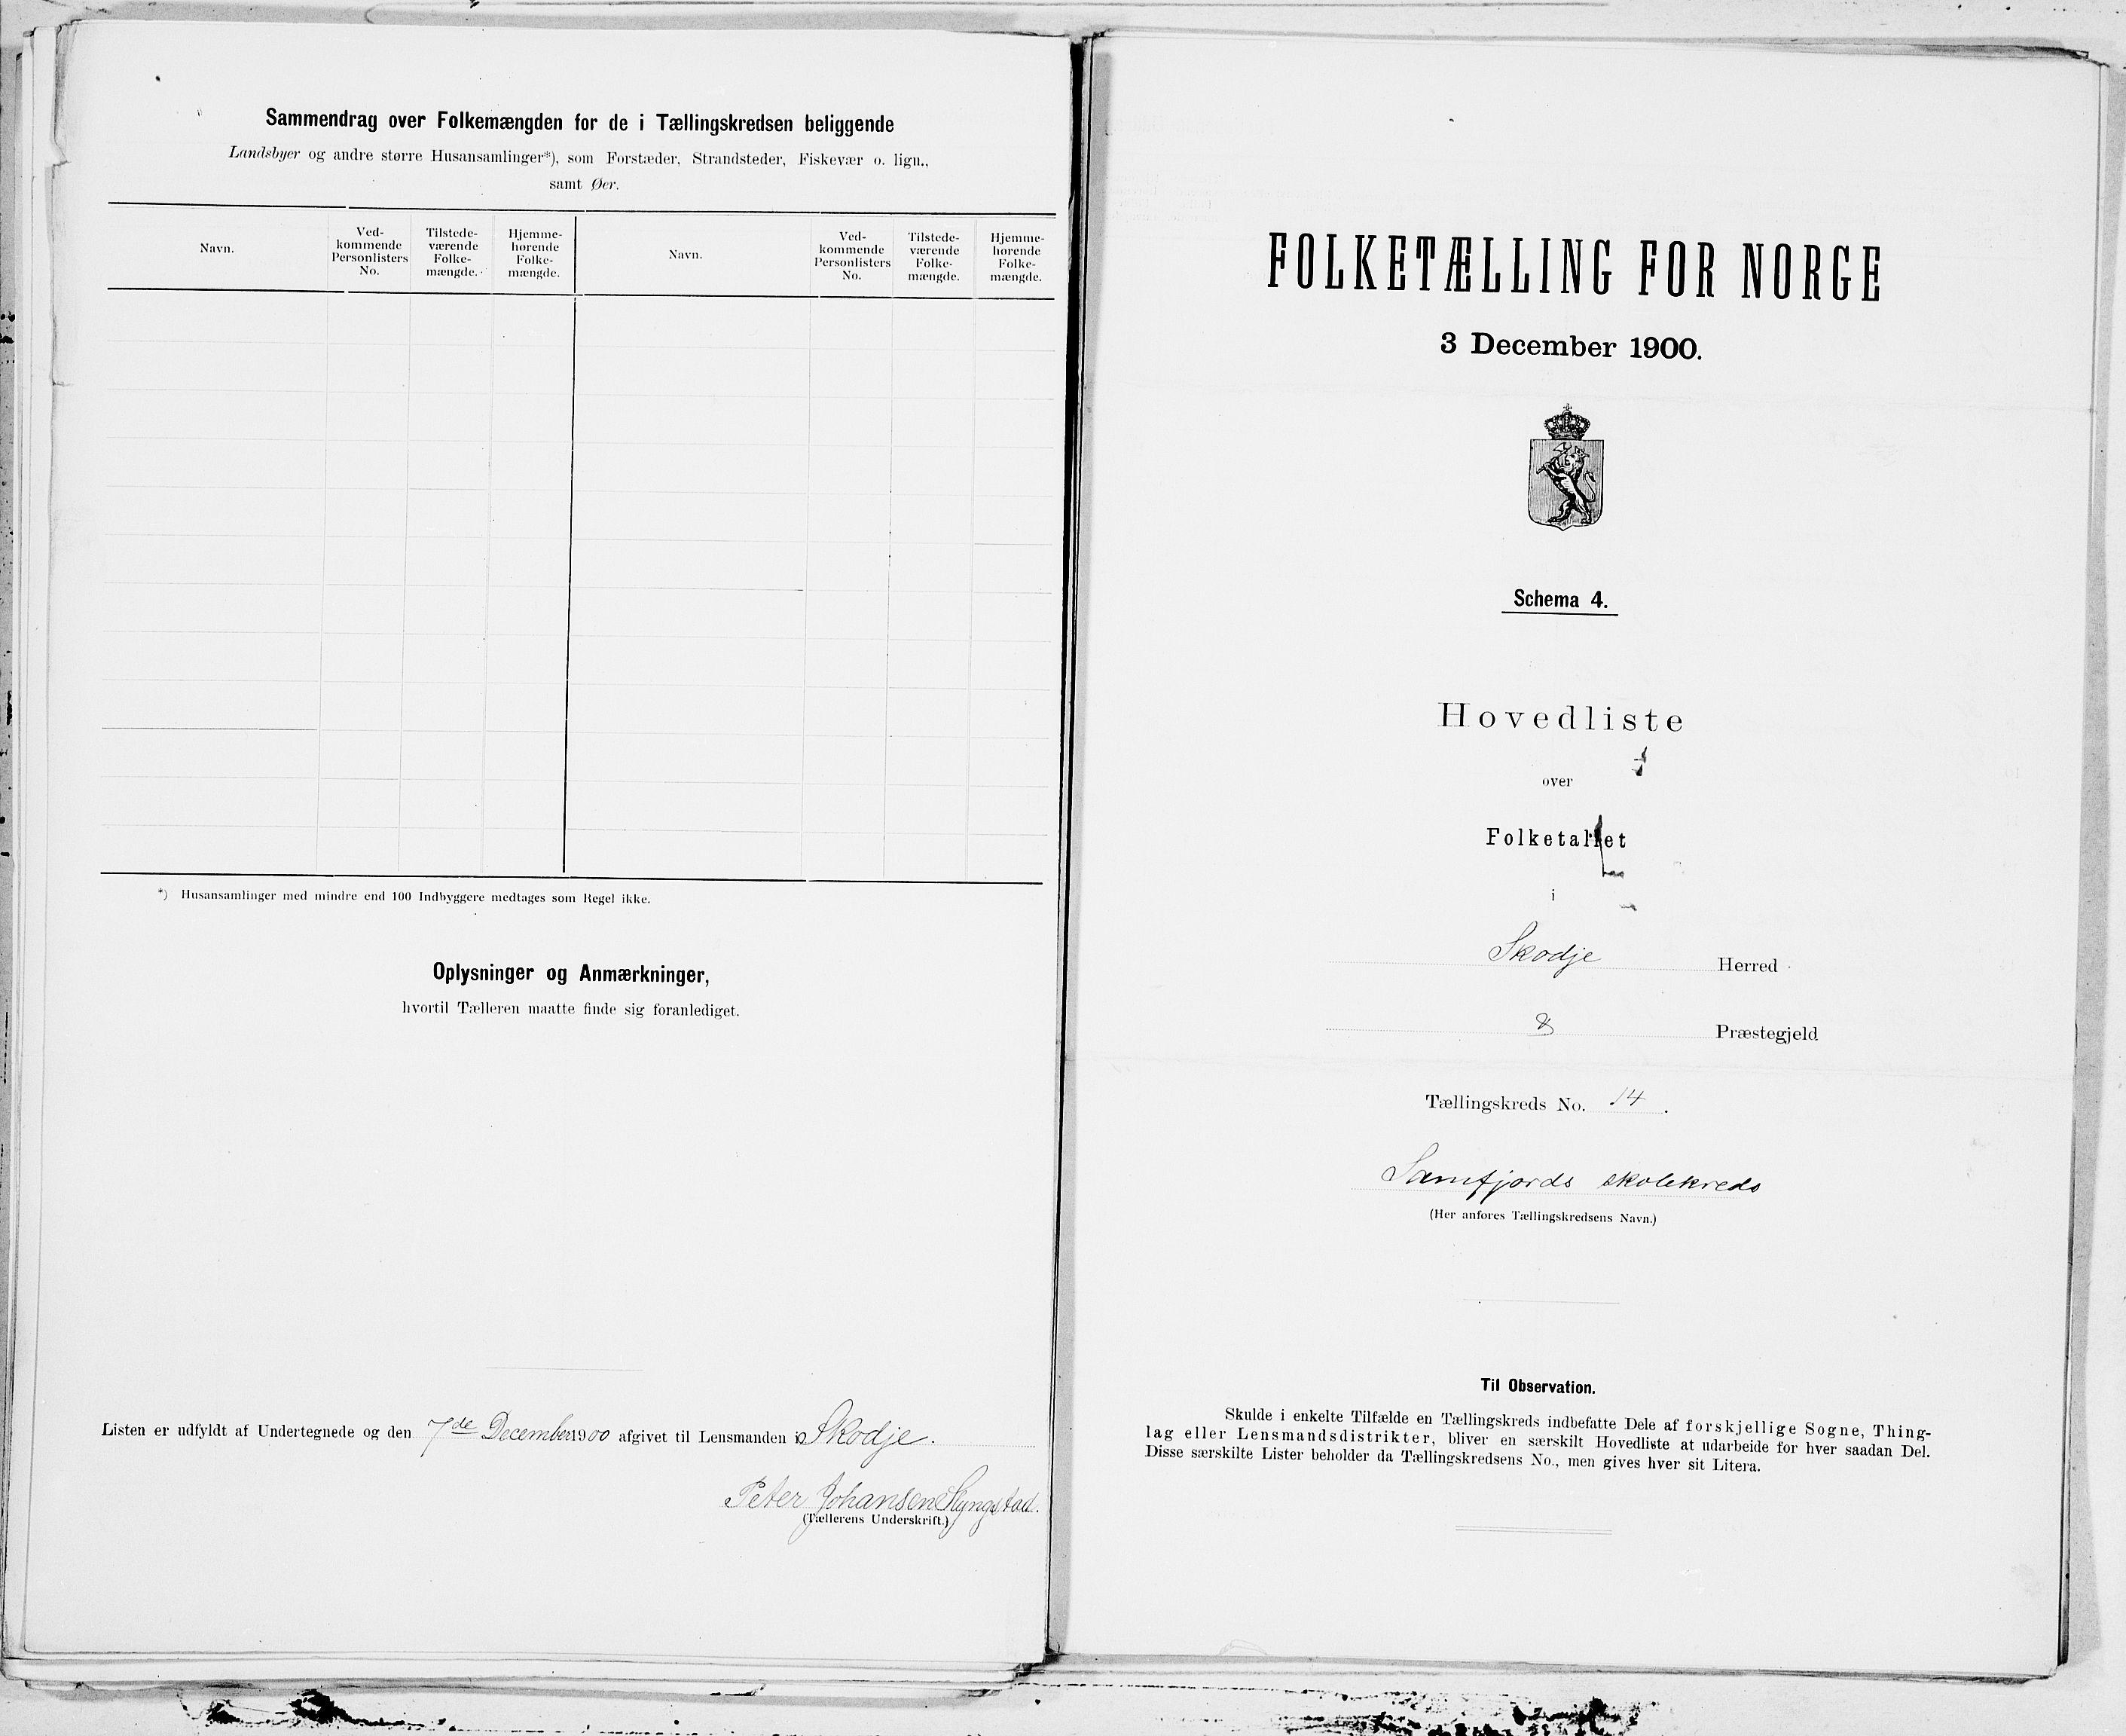 SAT, 1900 census for Skodje, 1900, p. 28